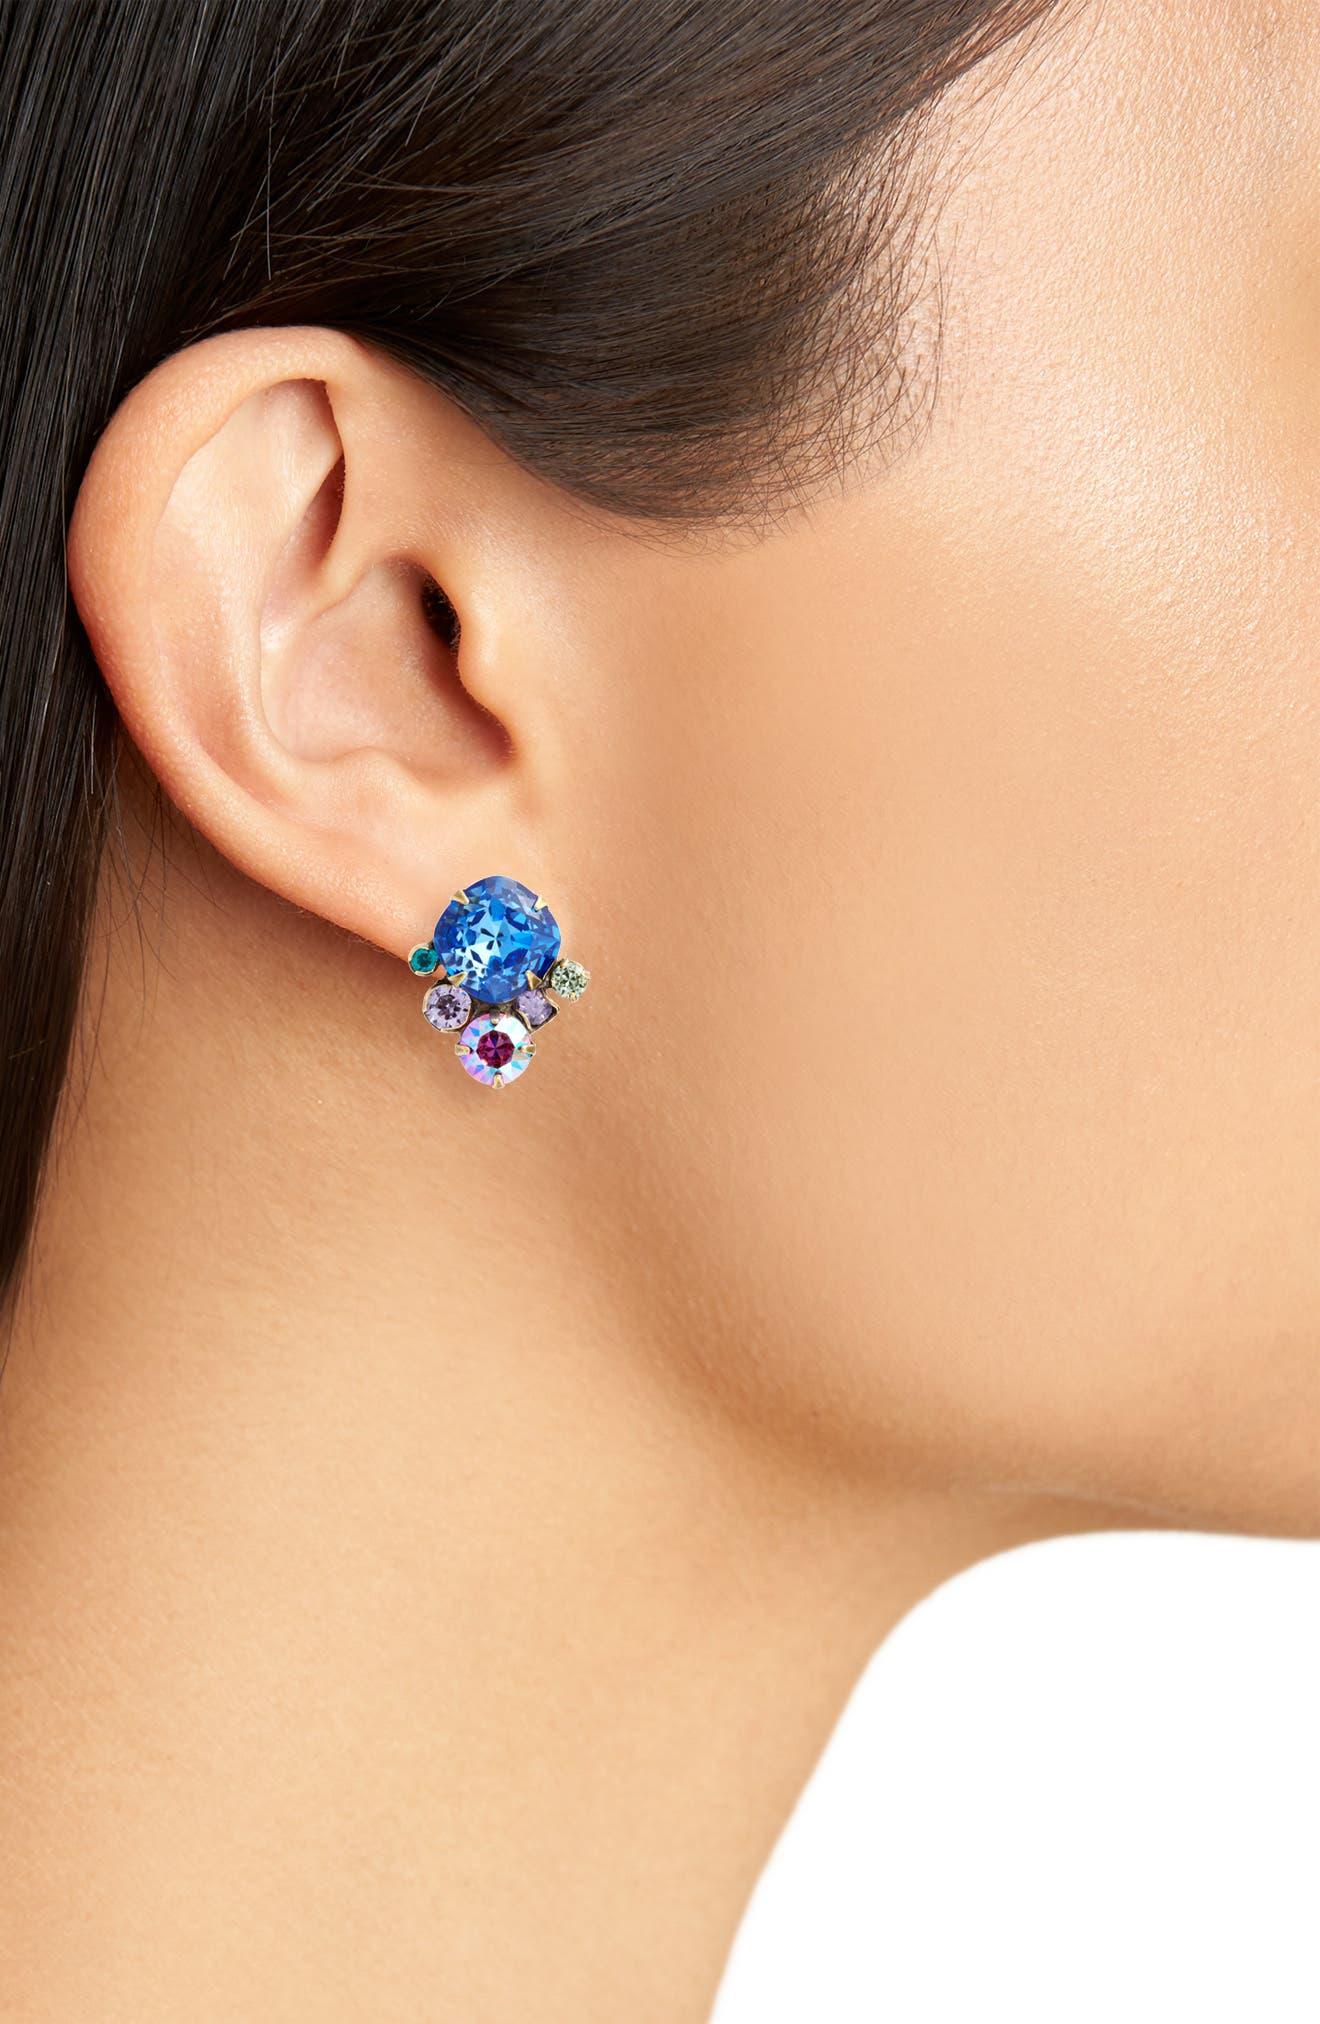 Brugmansia Crystal Earrings,                             Alternate thumbnail 2, color,                             Blue